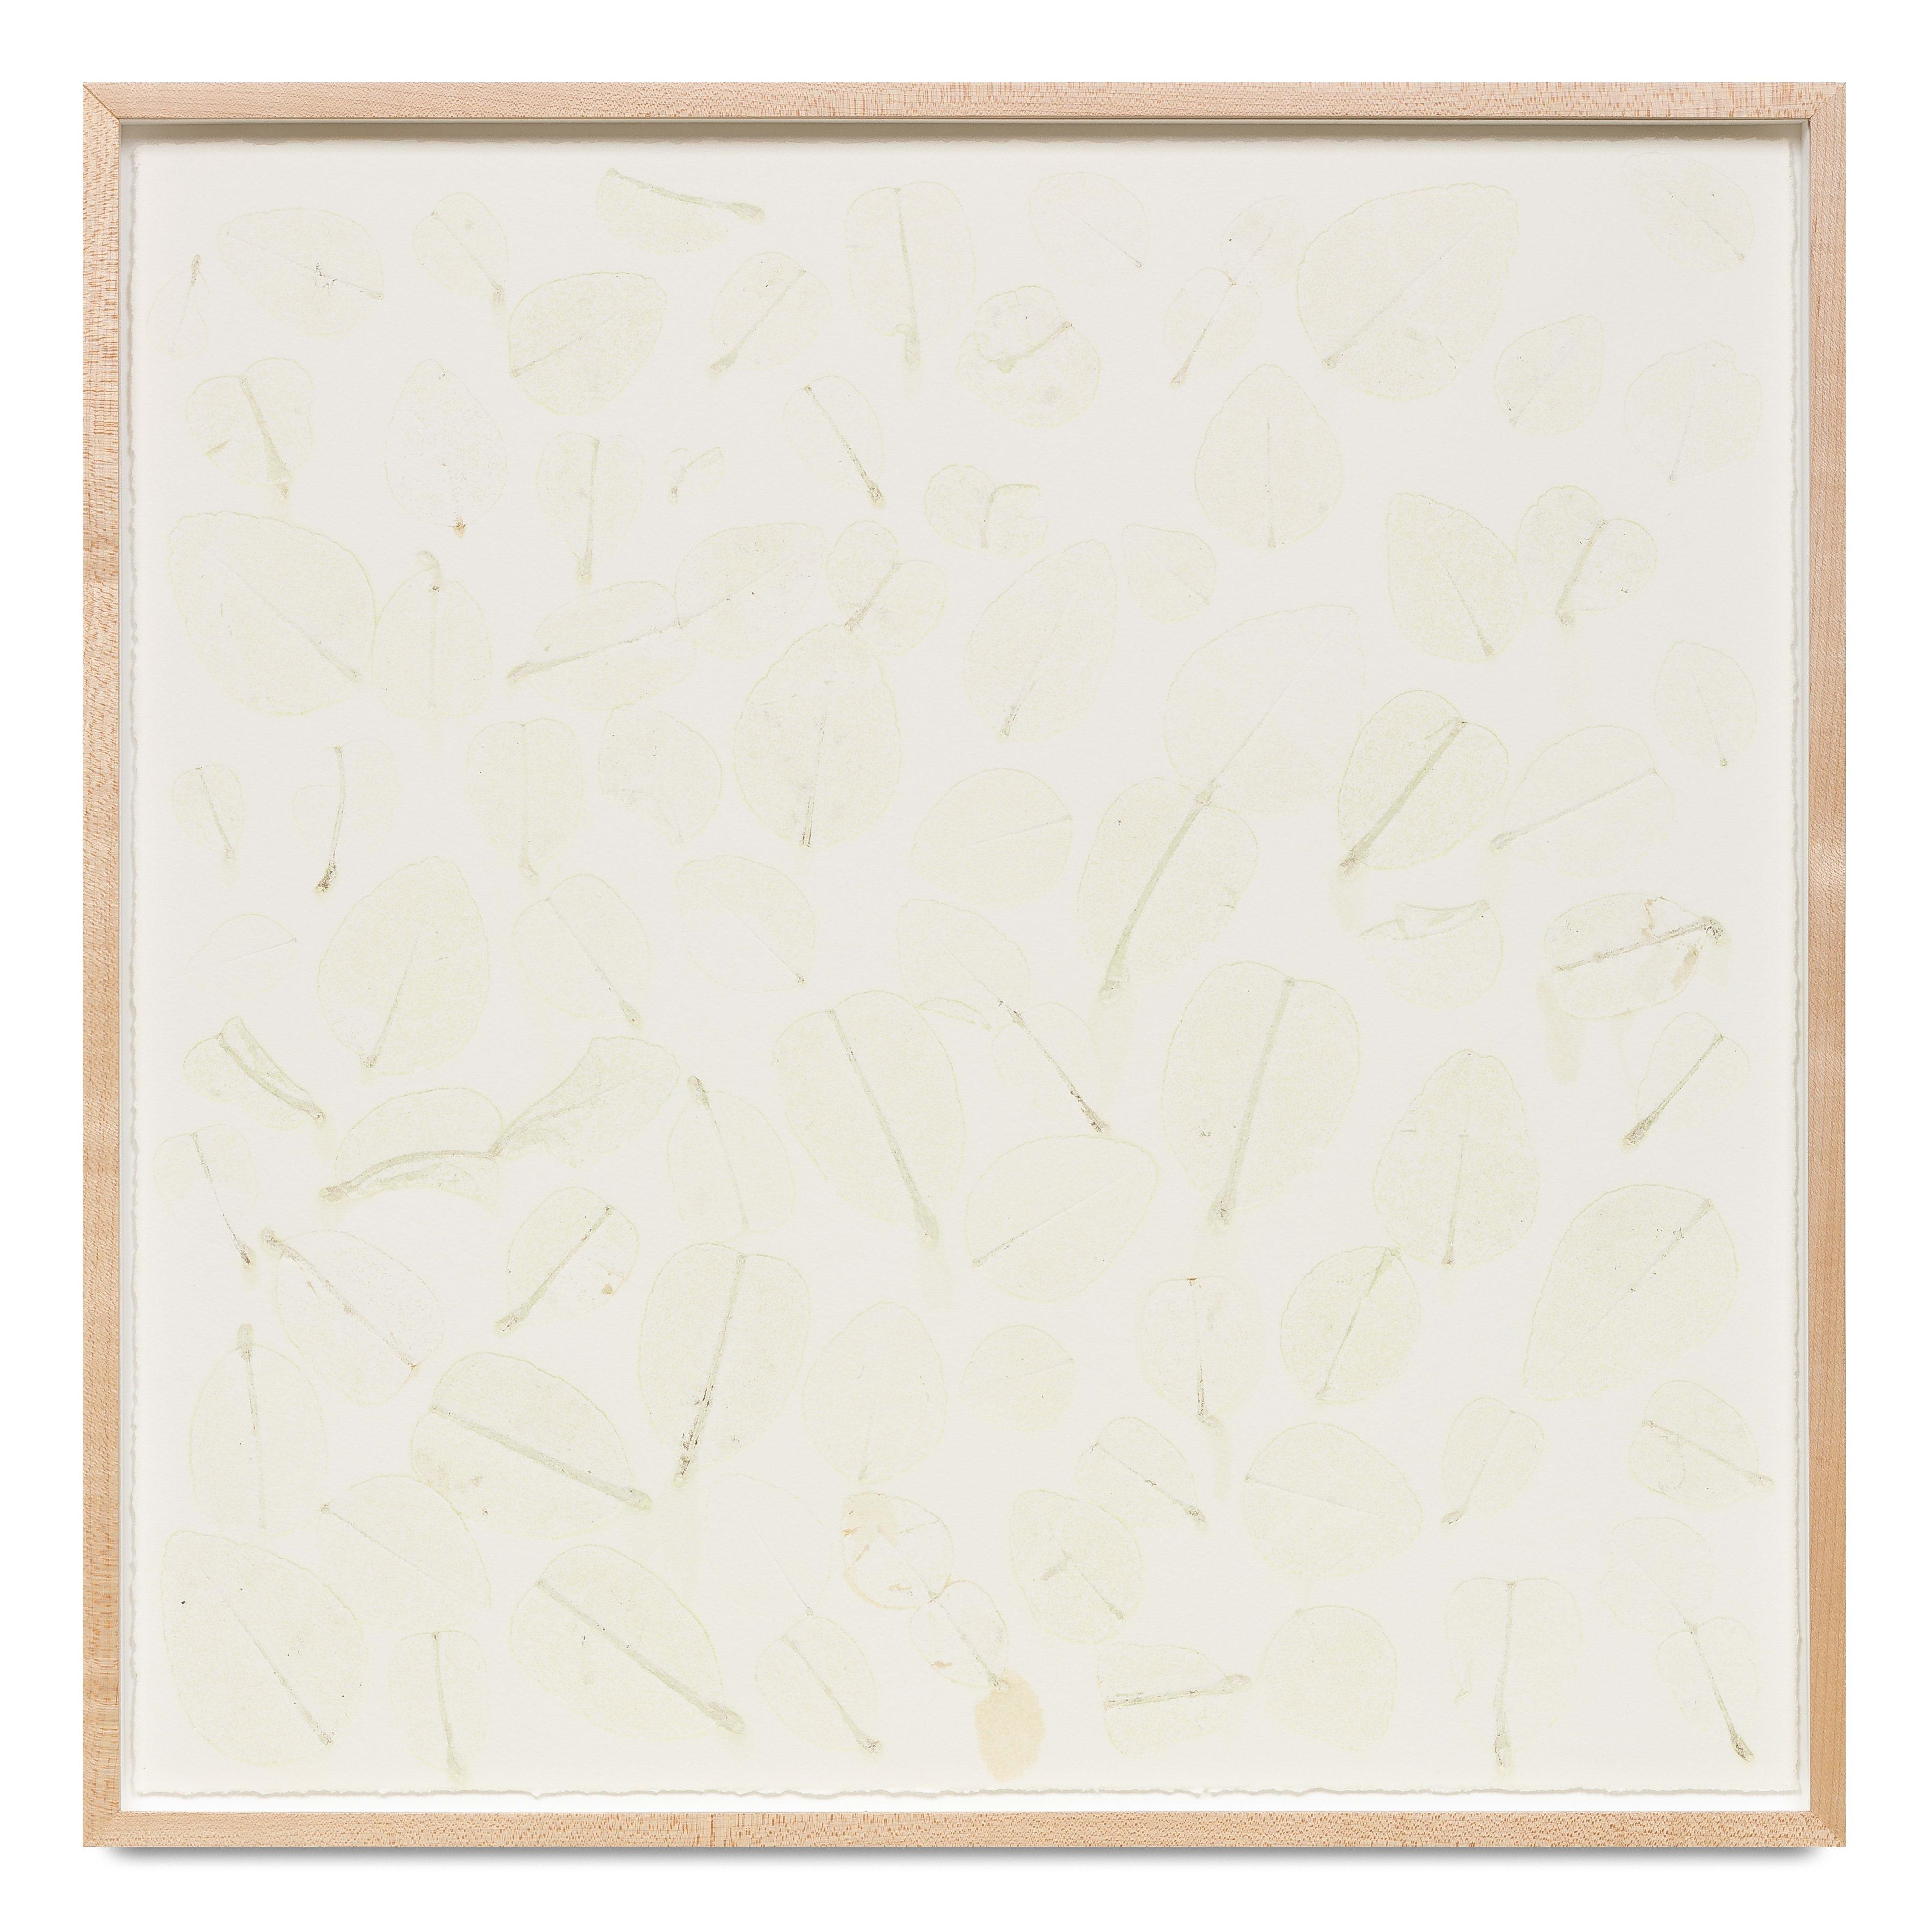 Edibles - Cold Storage, Fresh Pick, Lime Leaf, 50g by Haegue Yang